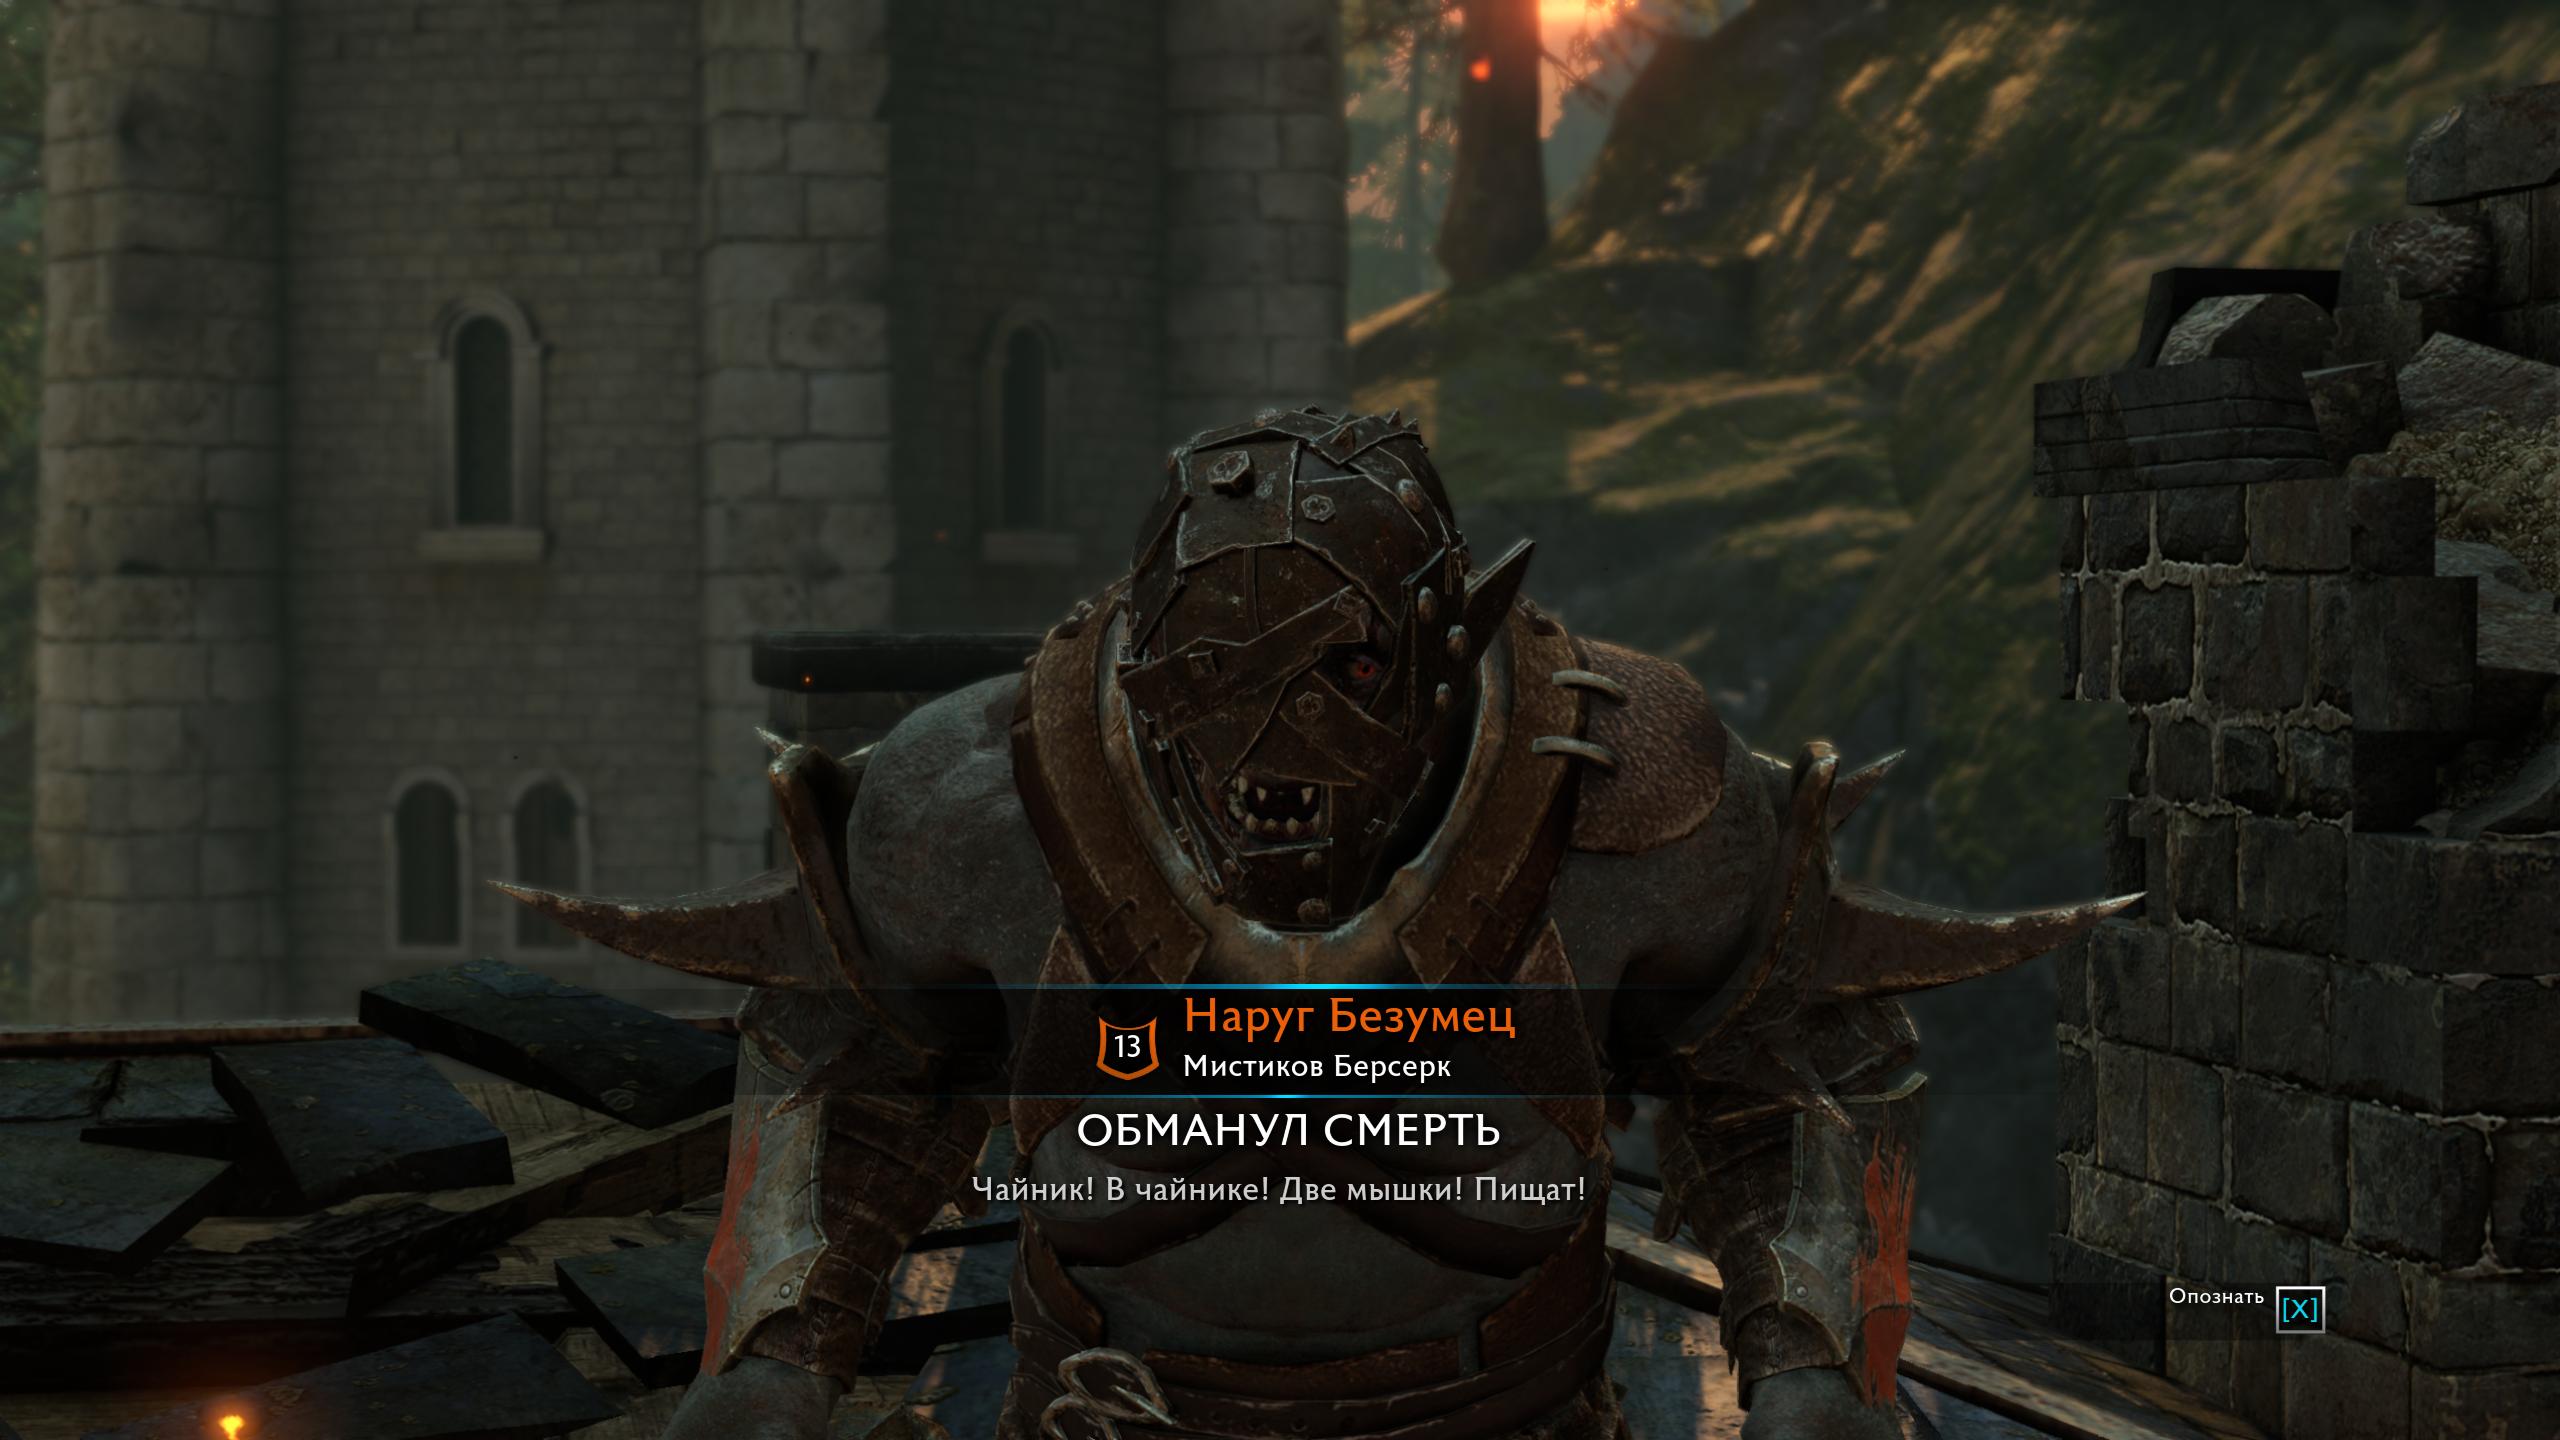 Наруг Безумец - Middle-earth: Shadow of War